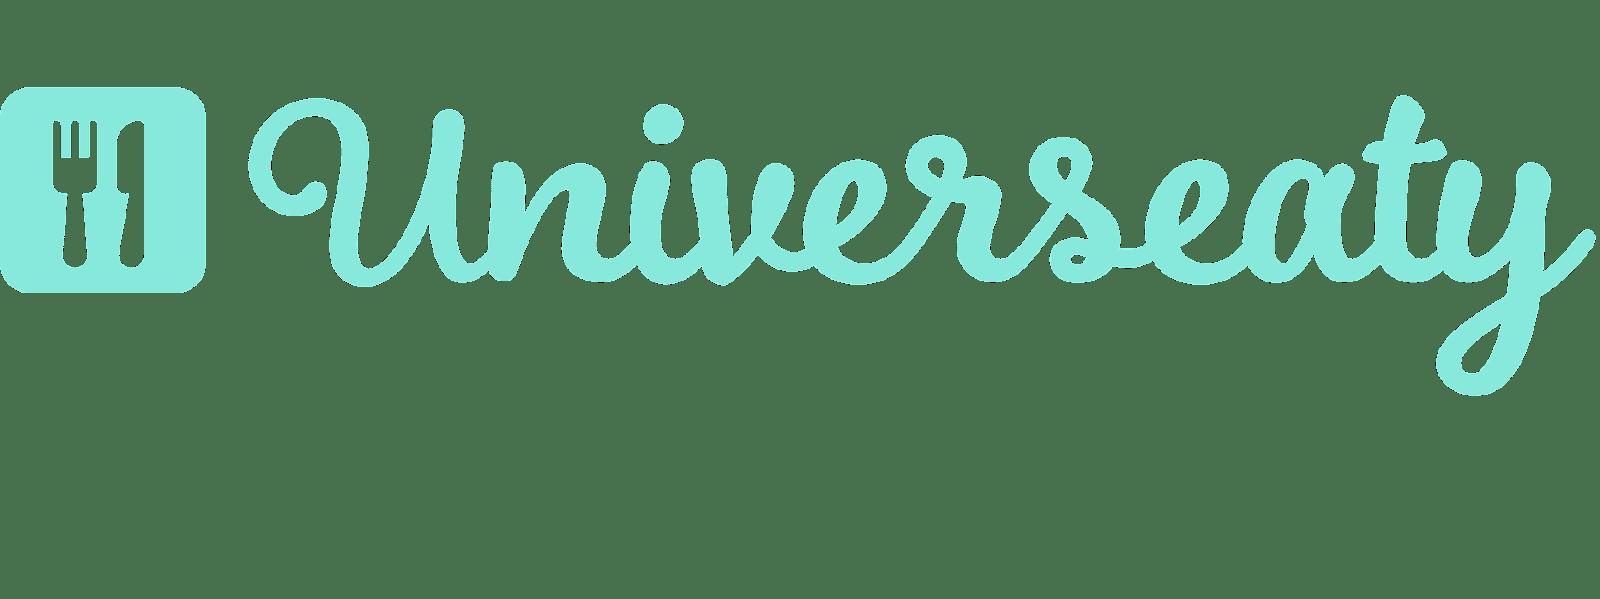 Universeaty logo